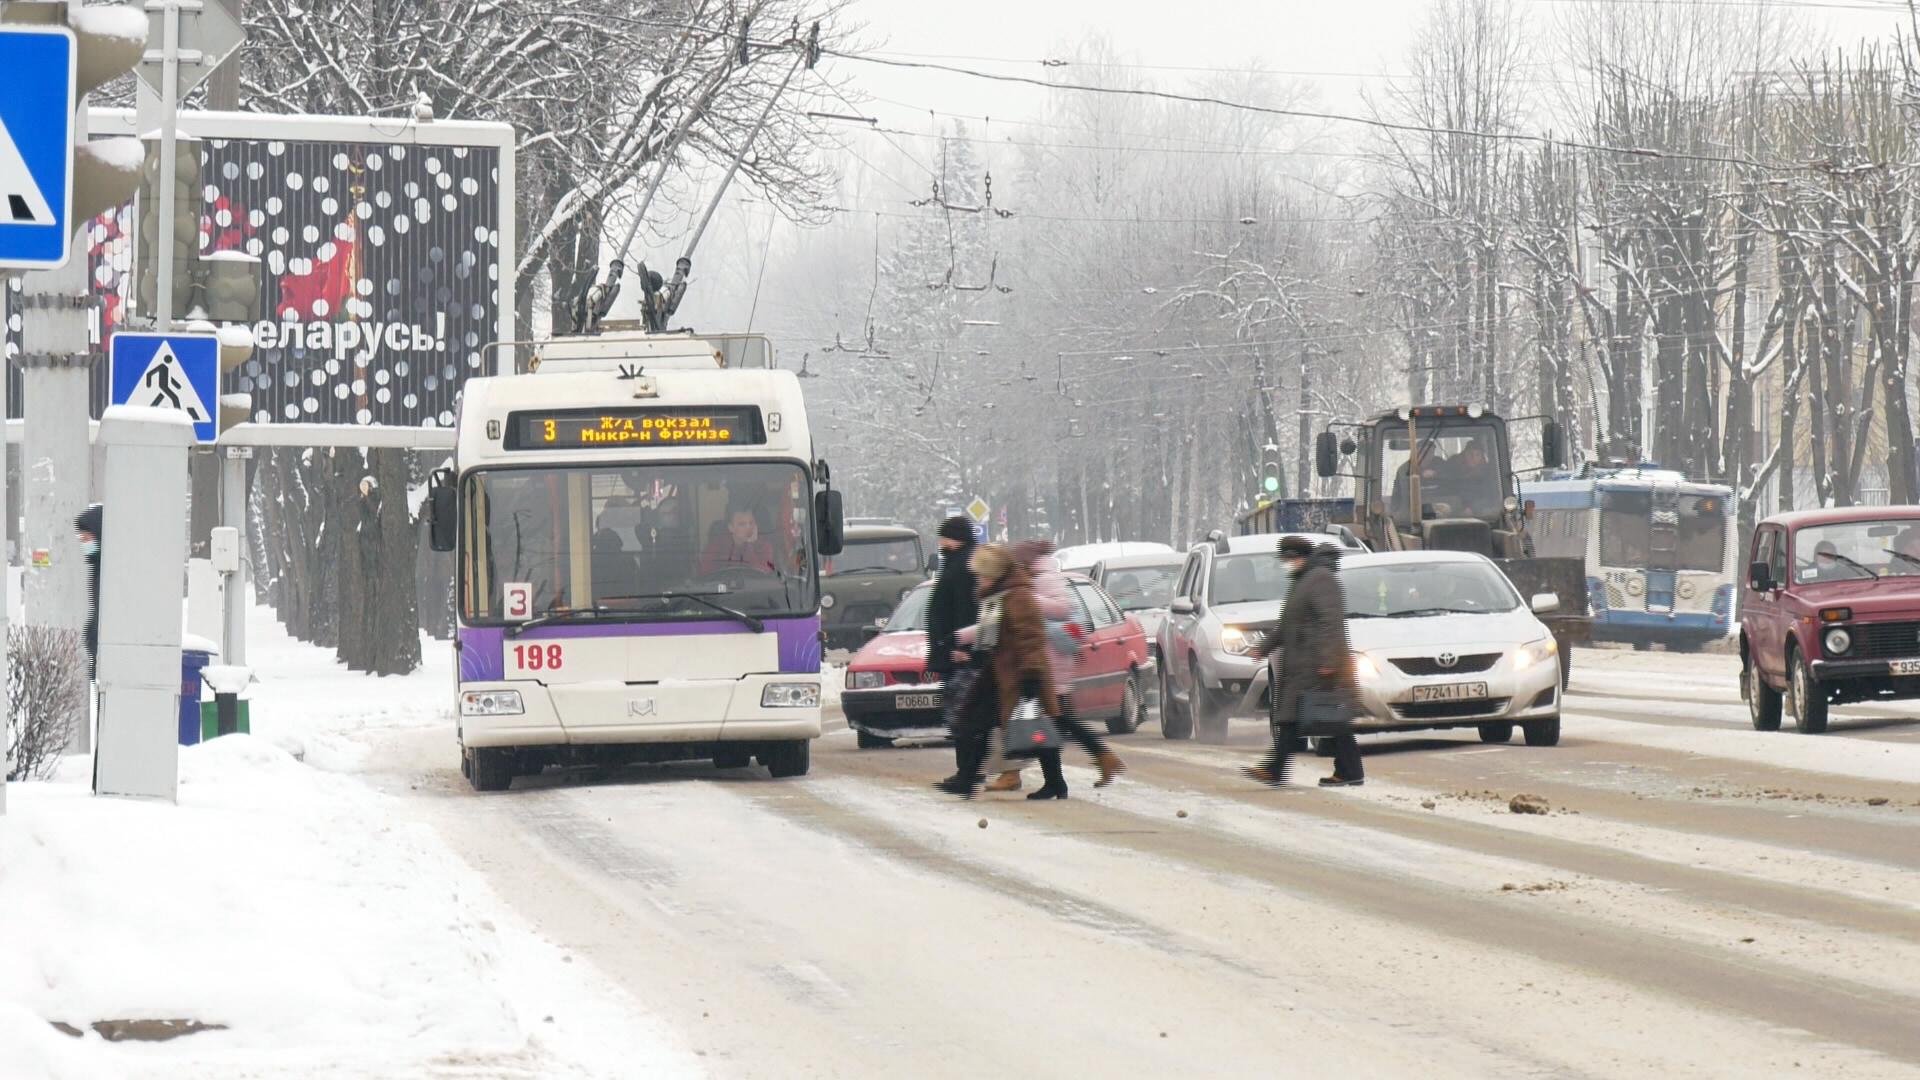 trollejbusy - Как в Витебске зимой работают троллейбусы? (видео)